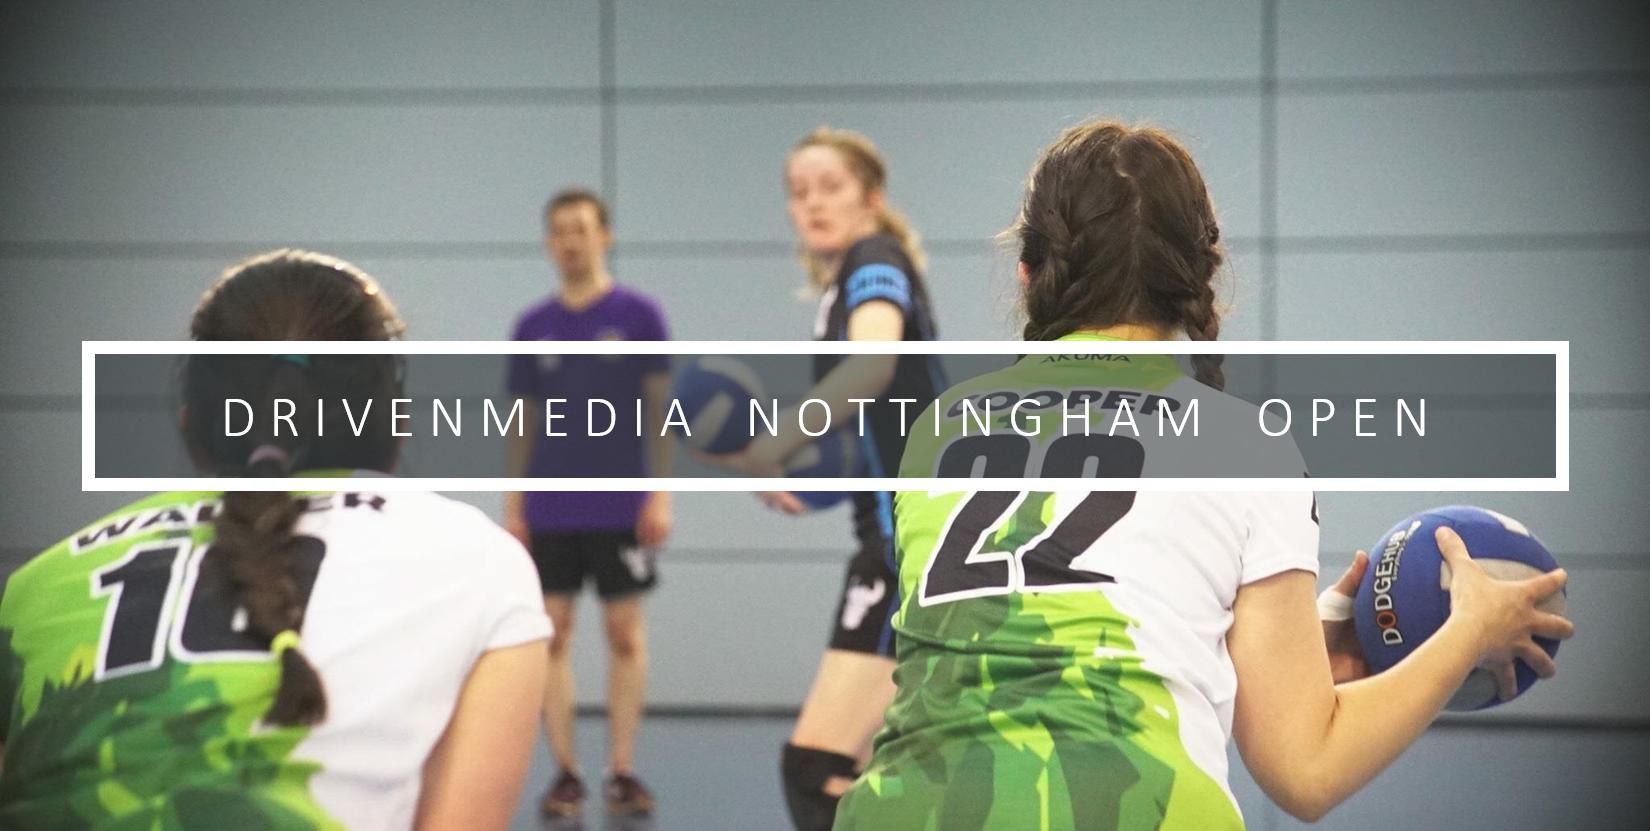 DrivenMedia Nottingham Open